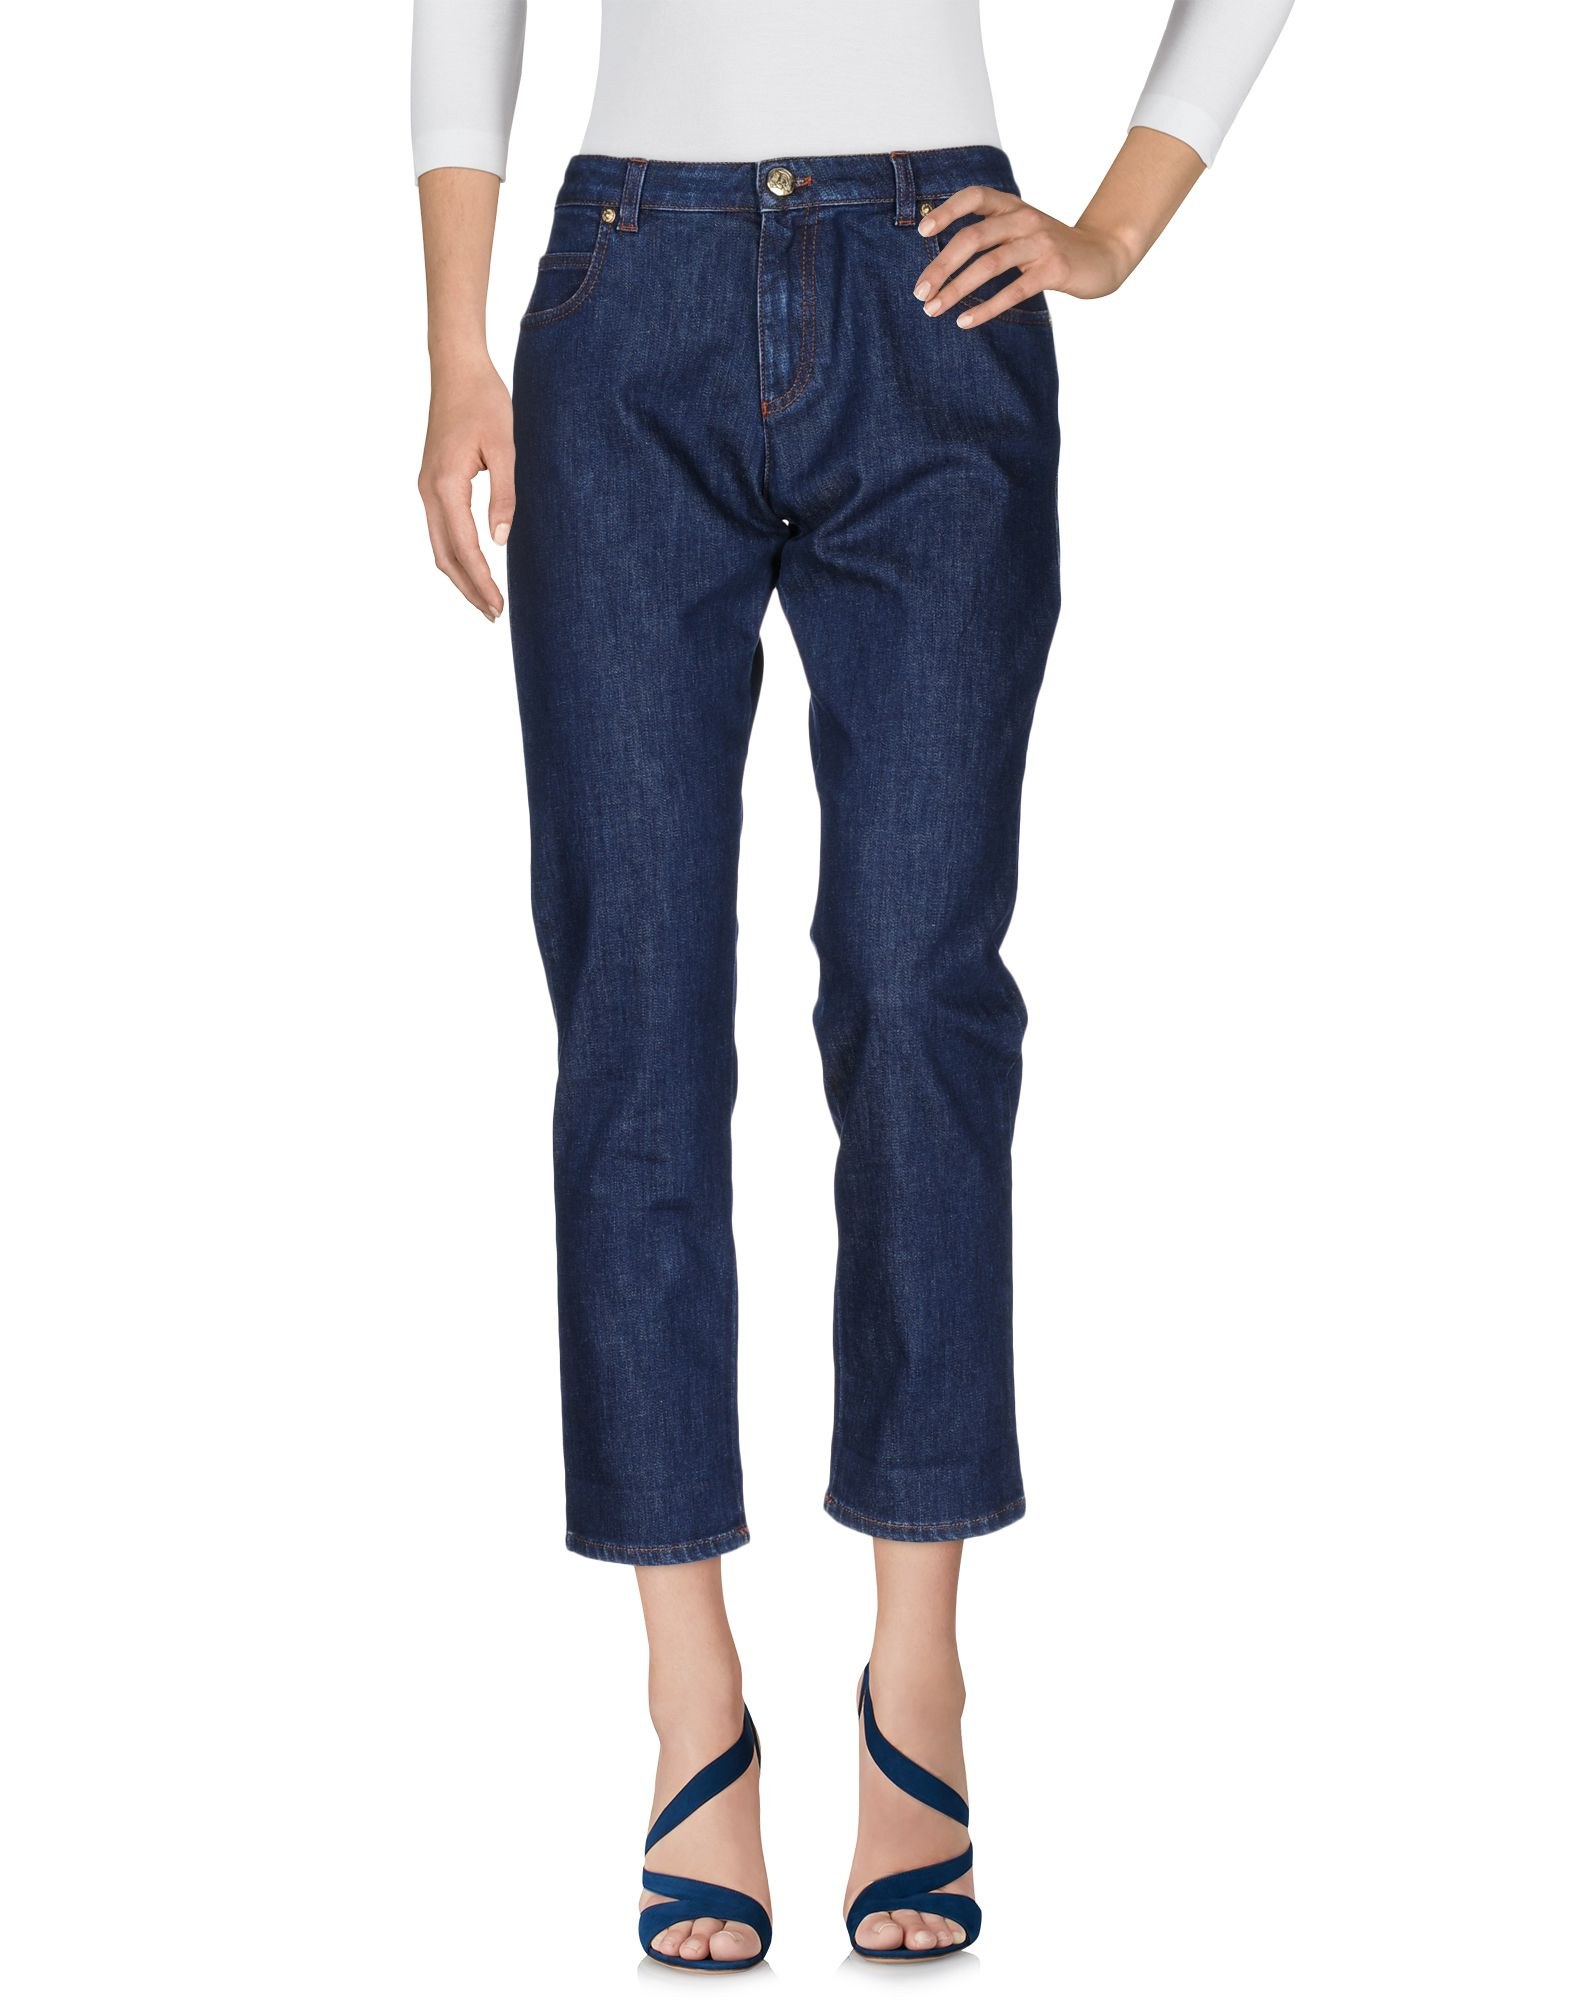 Pantaloni Jeans Sonia Rykiel Donna - Acquista online su 9QUjMpfCF